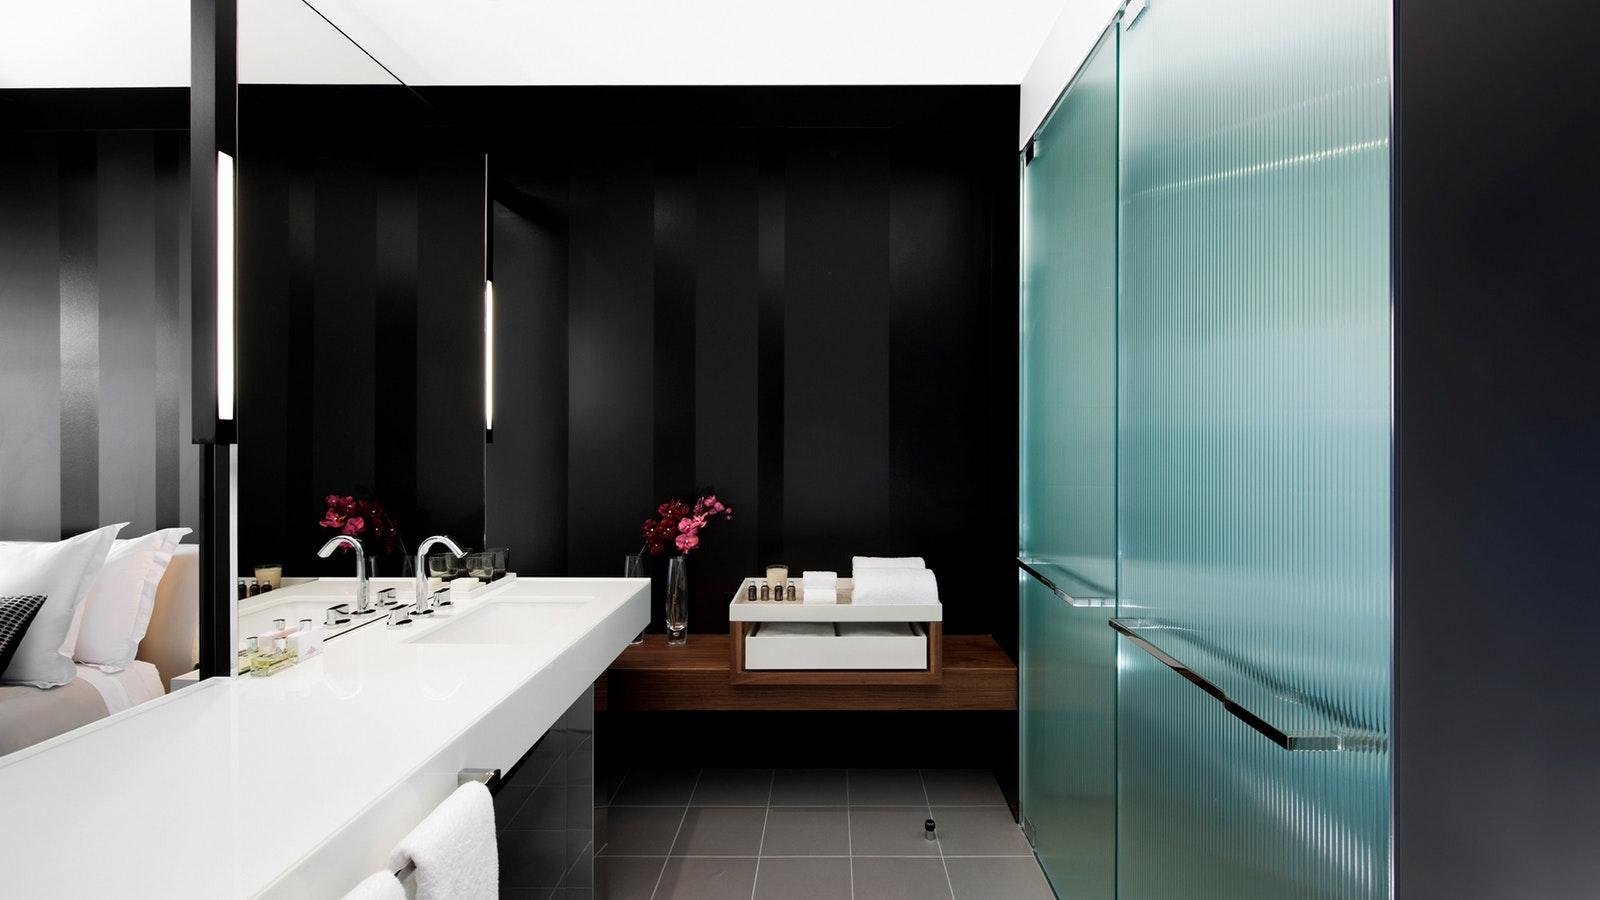 Luxe Room Bathroom